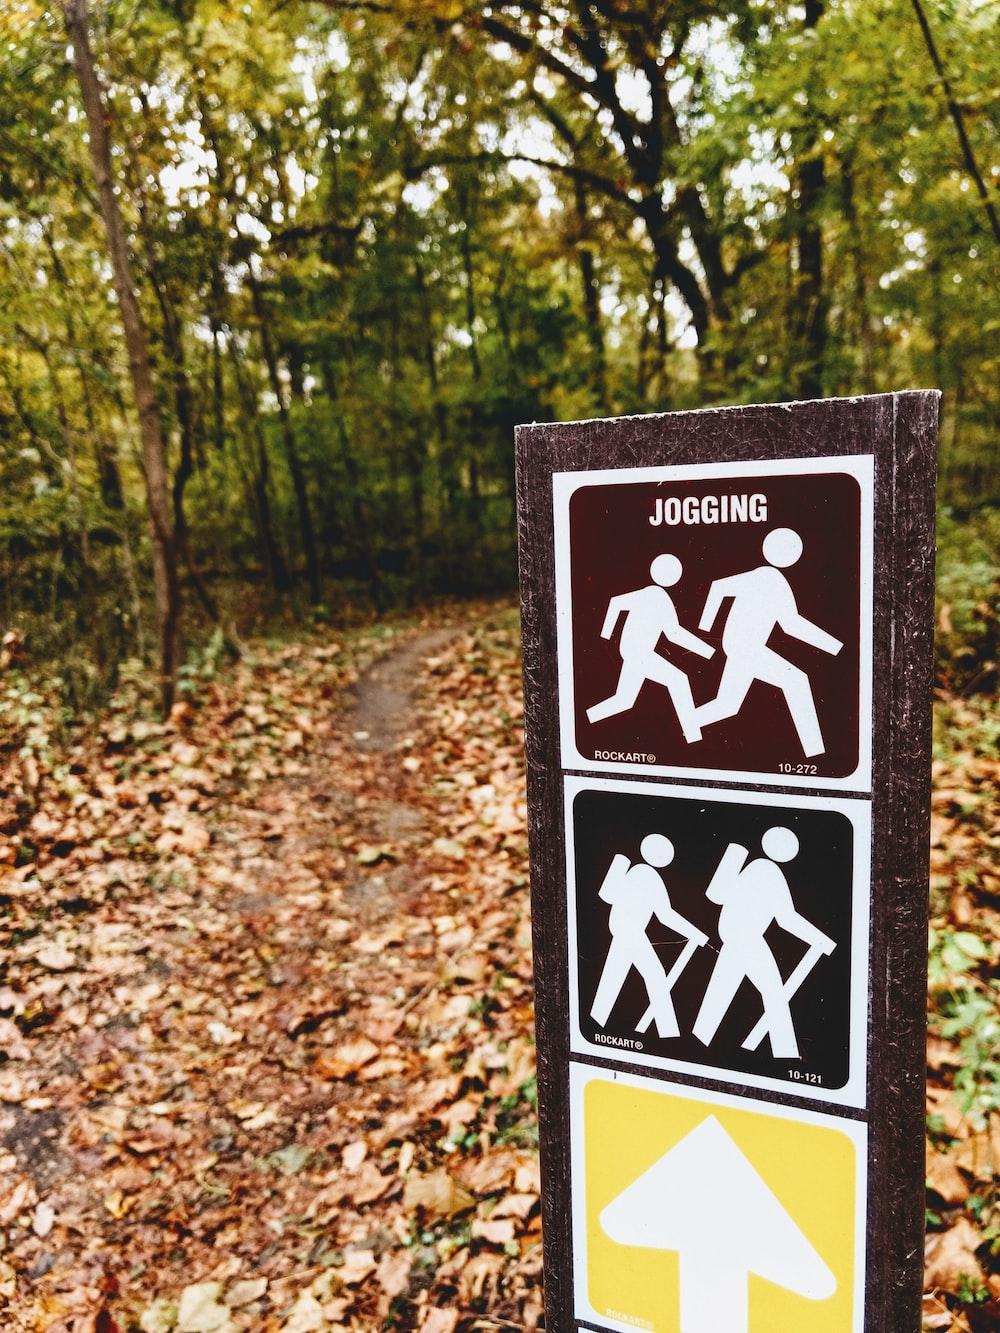 Jogging signage